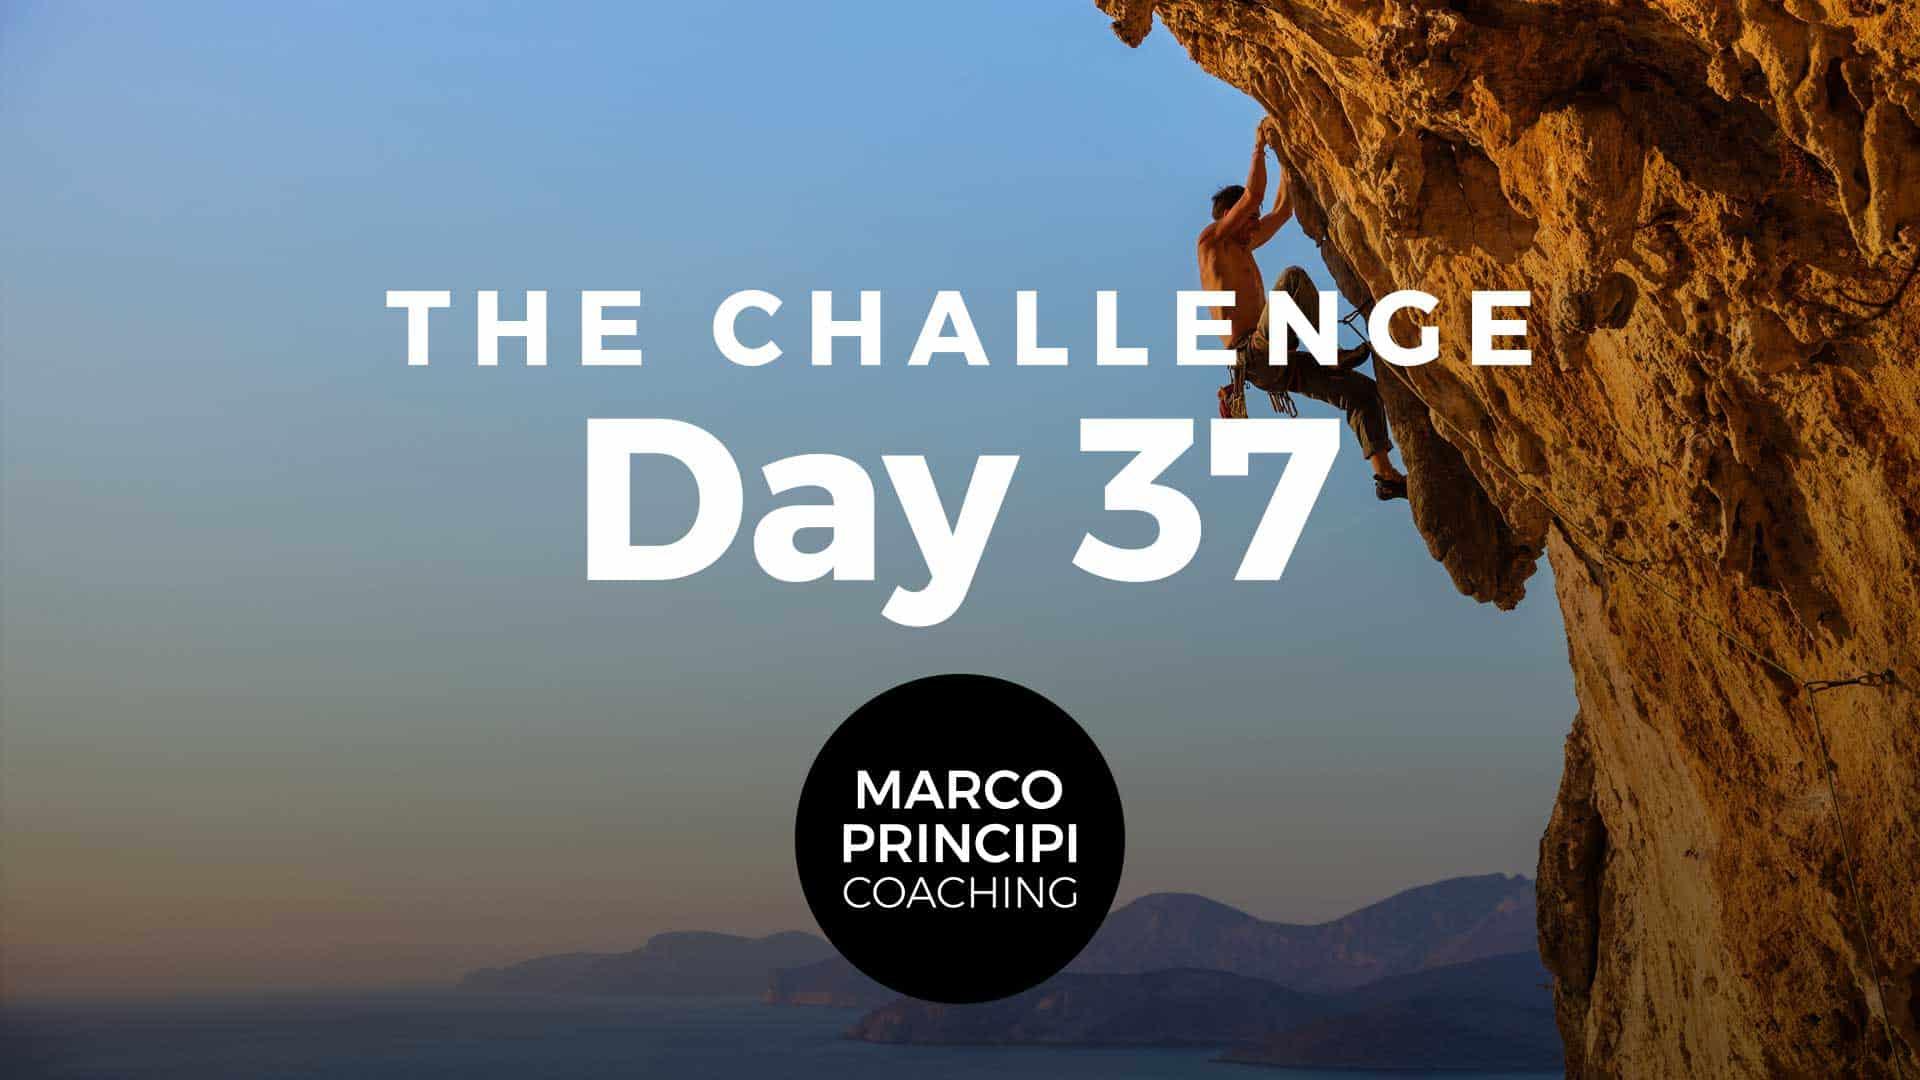 Marco Principi The Challenge Day 37